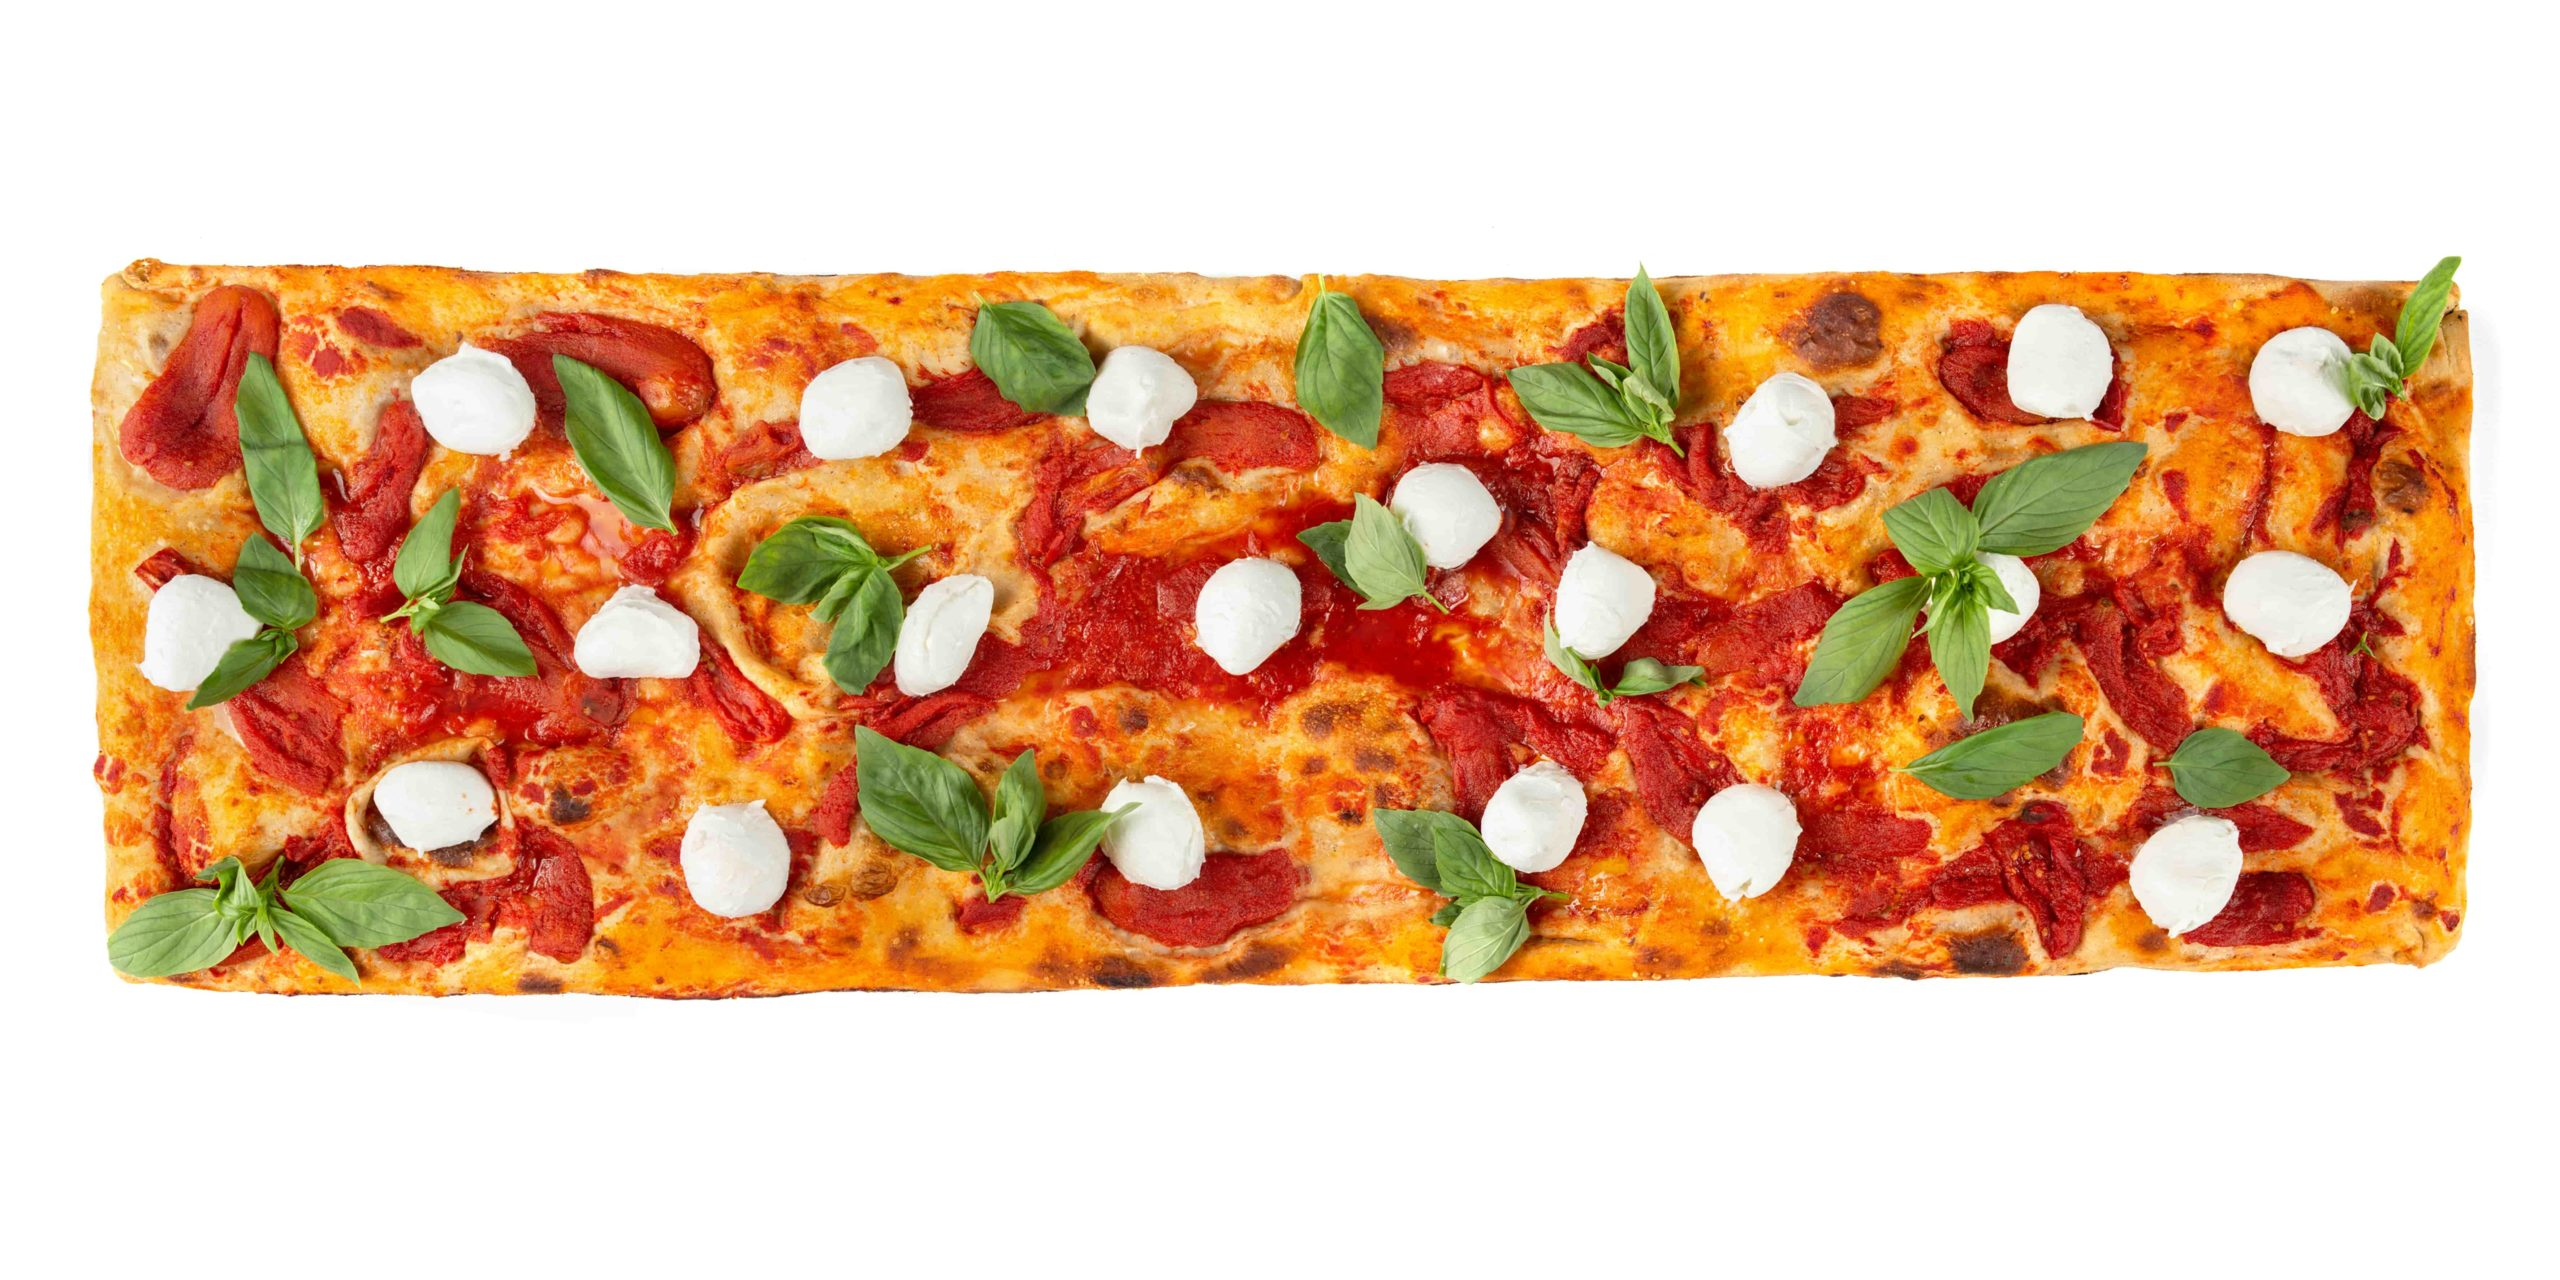 Futura Pizza Lab Friedrichshain Margherita